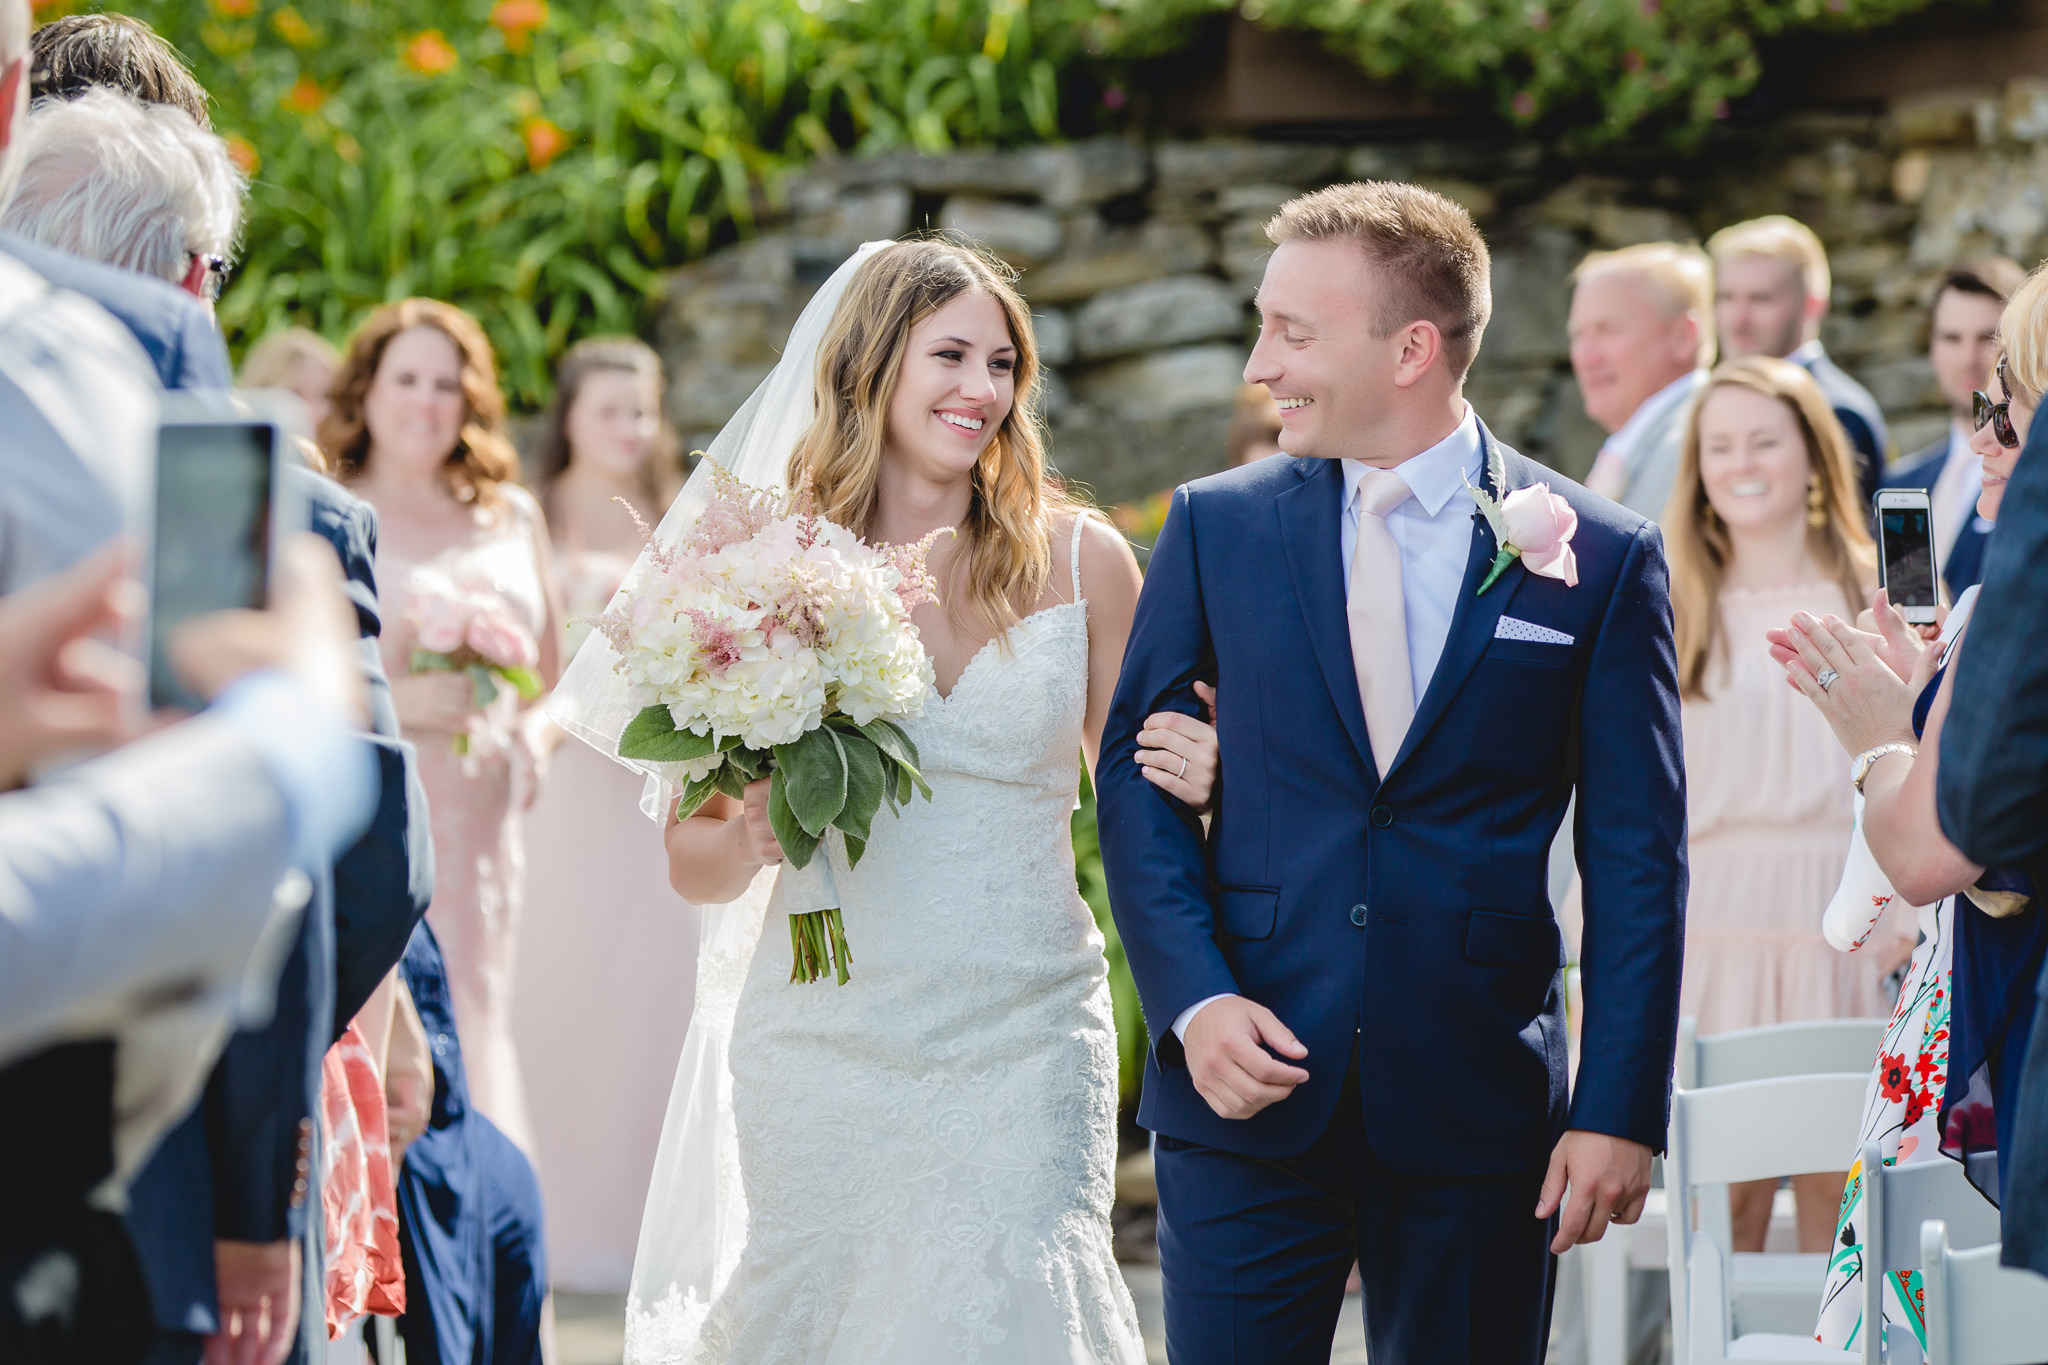 Newlyweds leaving their wedding ceremony at Hidden Valley Resort